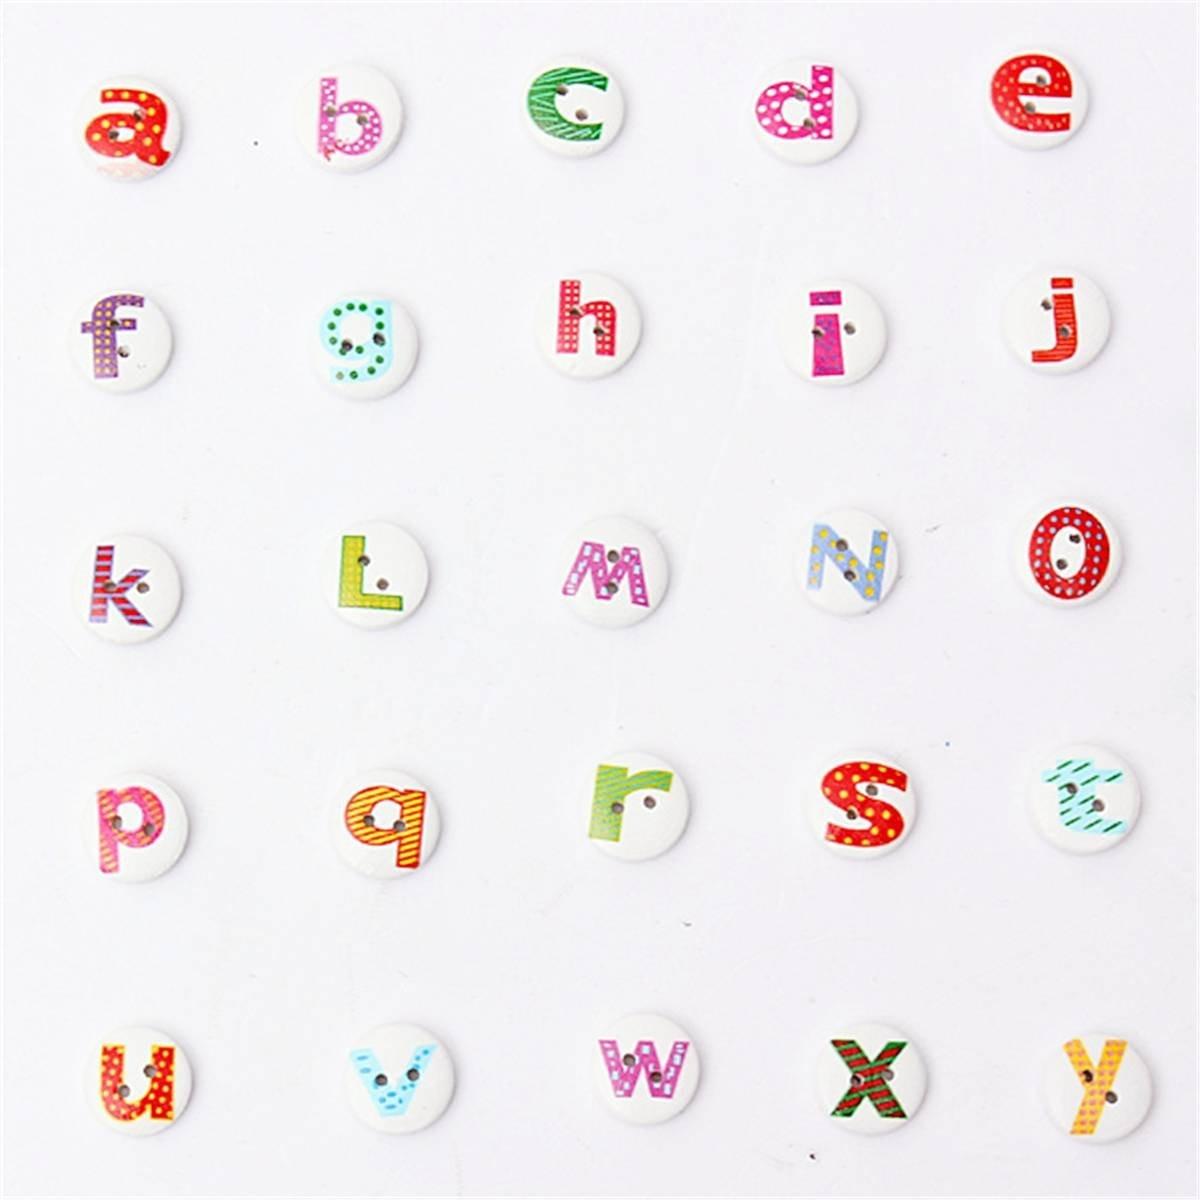 Practical Boutique 100Pcs Mixed Painted Letter Alphabet Wooden Sewing Button Scrapbooking